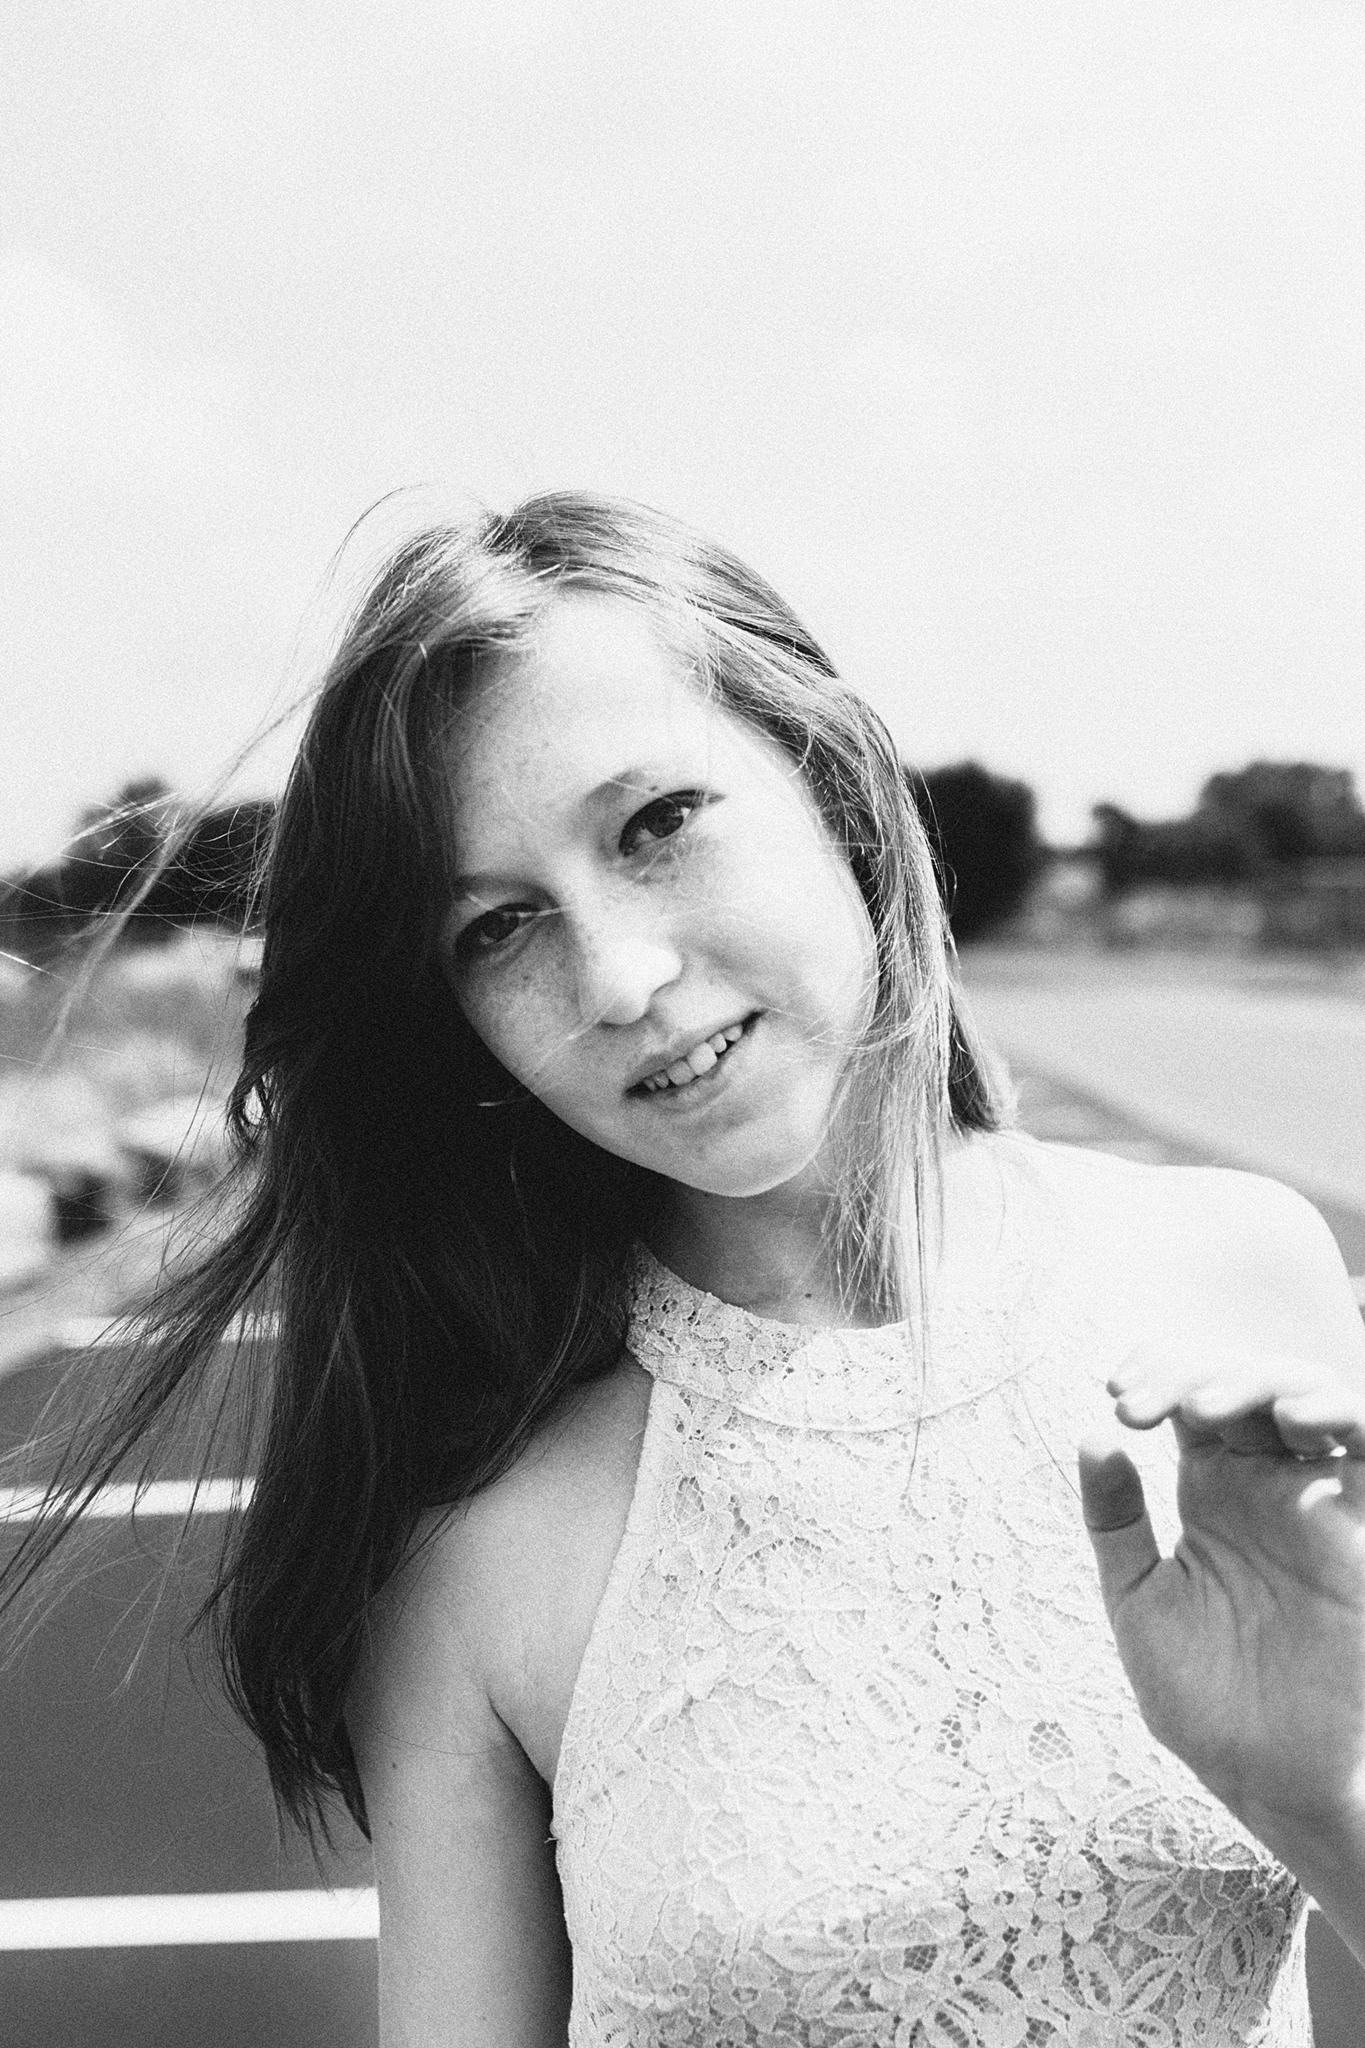 Bremerton High School Senior Portrait Photographer